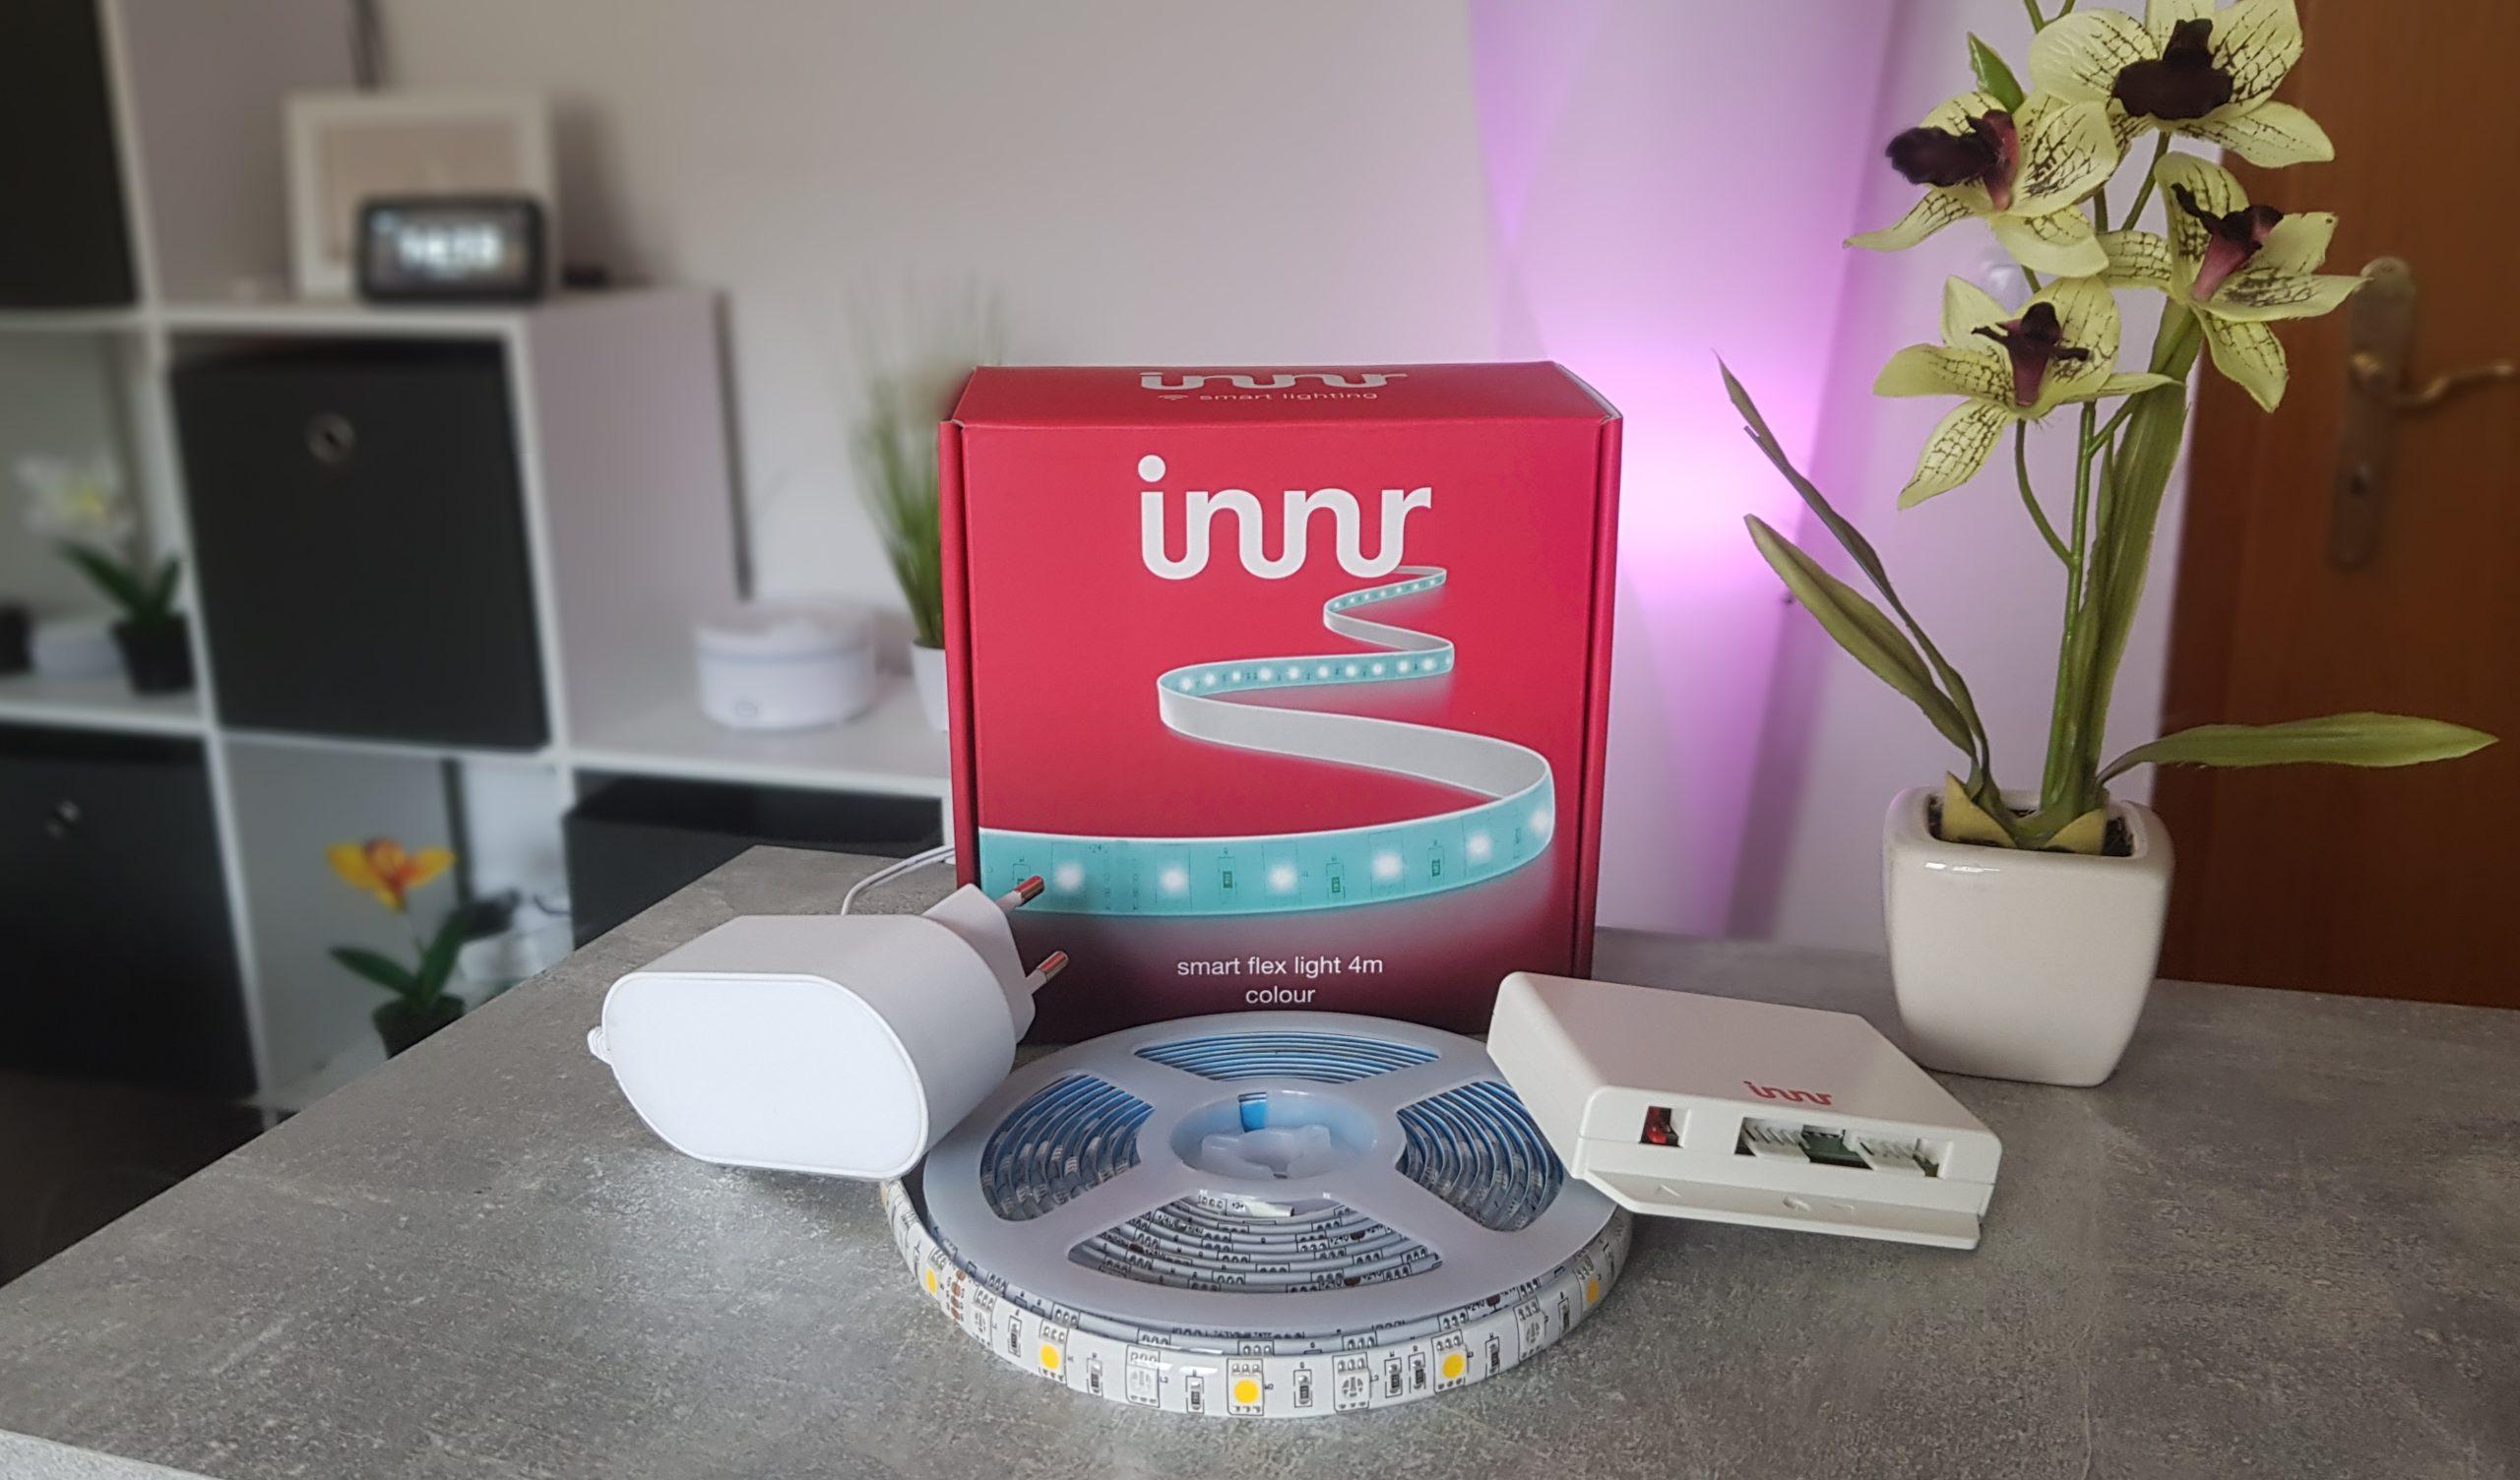 INNR Smart Flex Light 4m